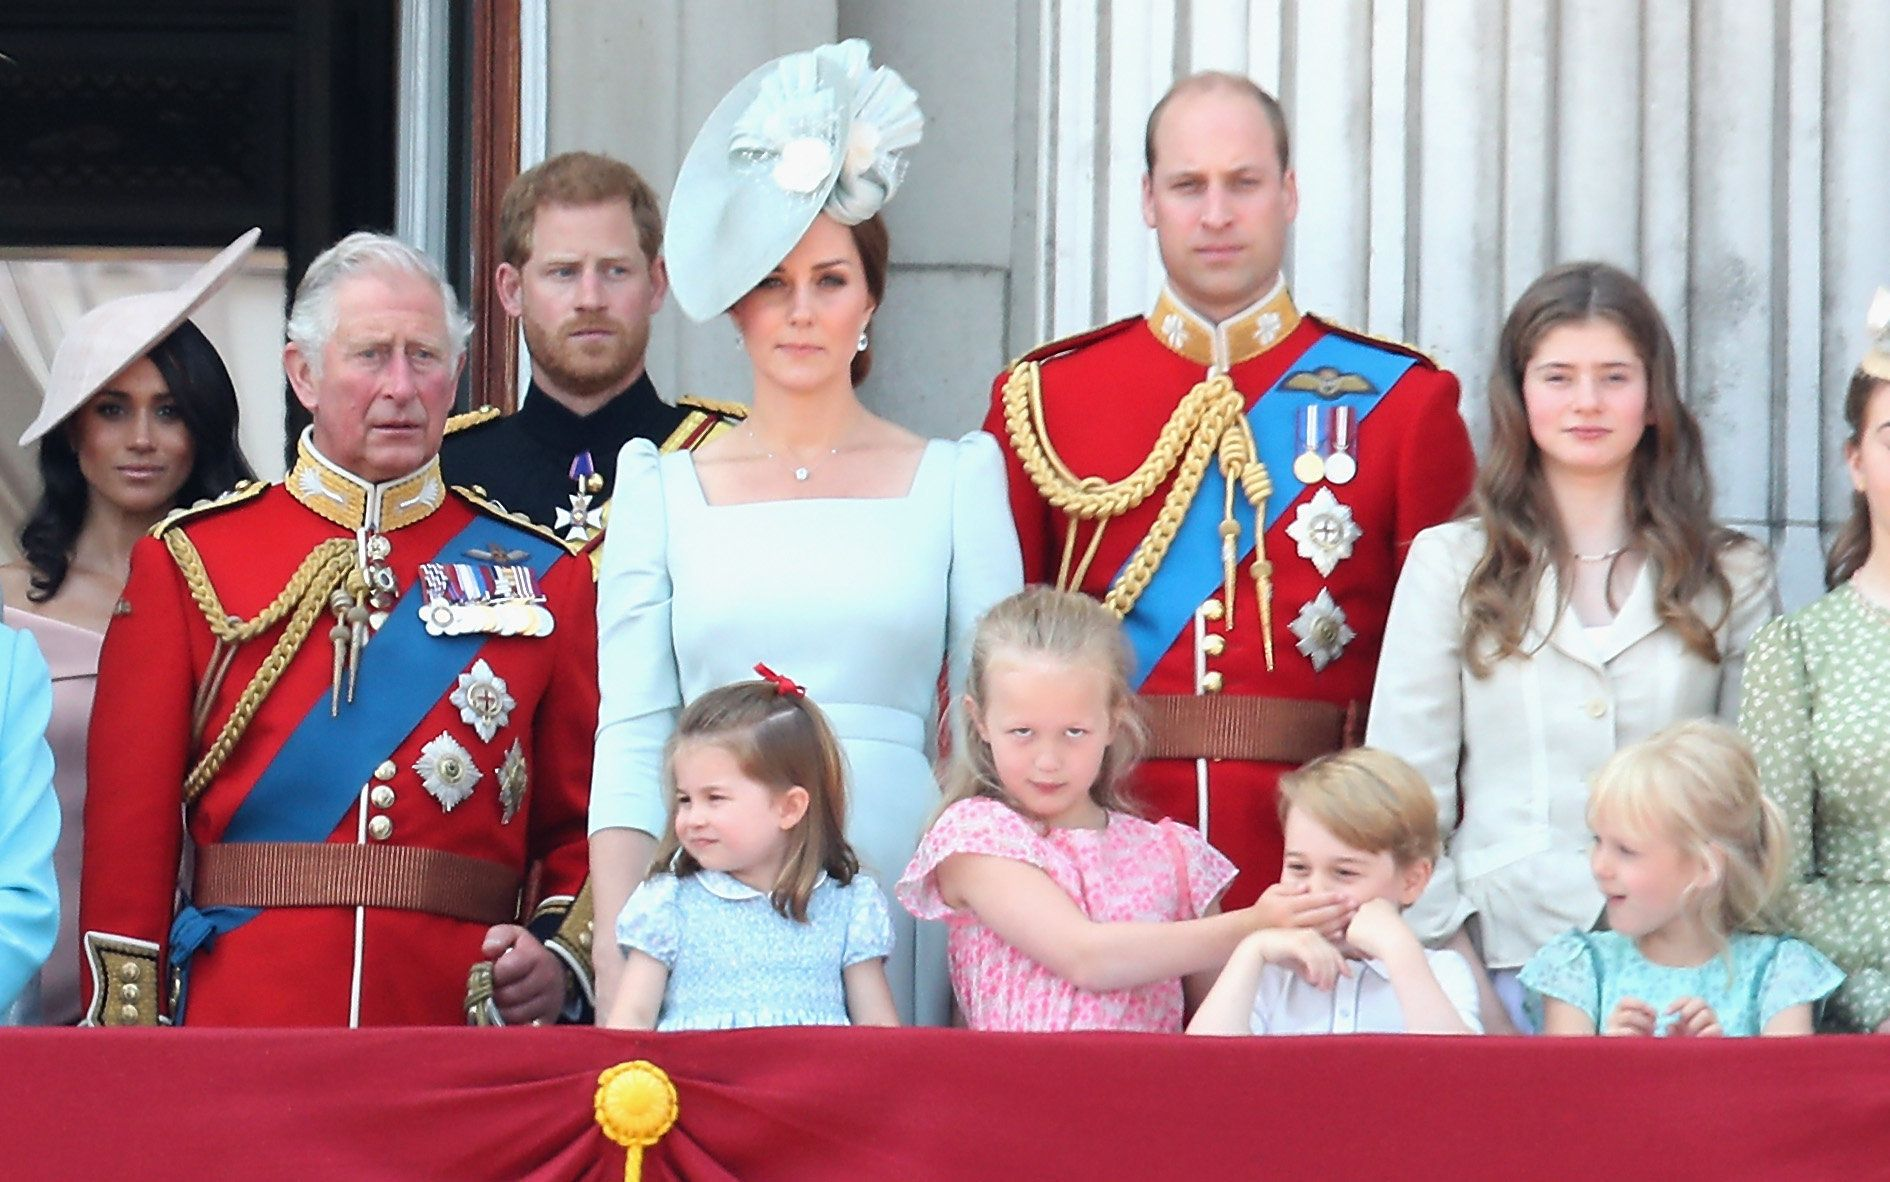 Experte: Deshalb trägt Herzogin Kate dieselbe Farbe wie Prinzessin Charlotte